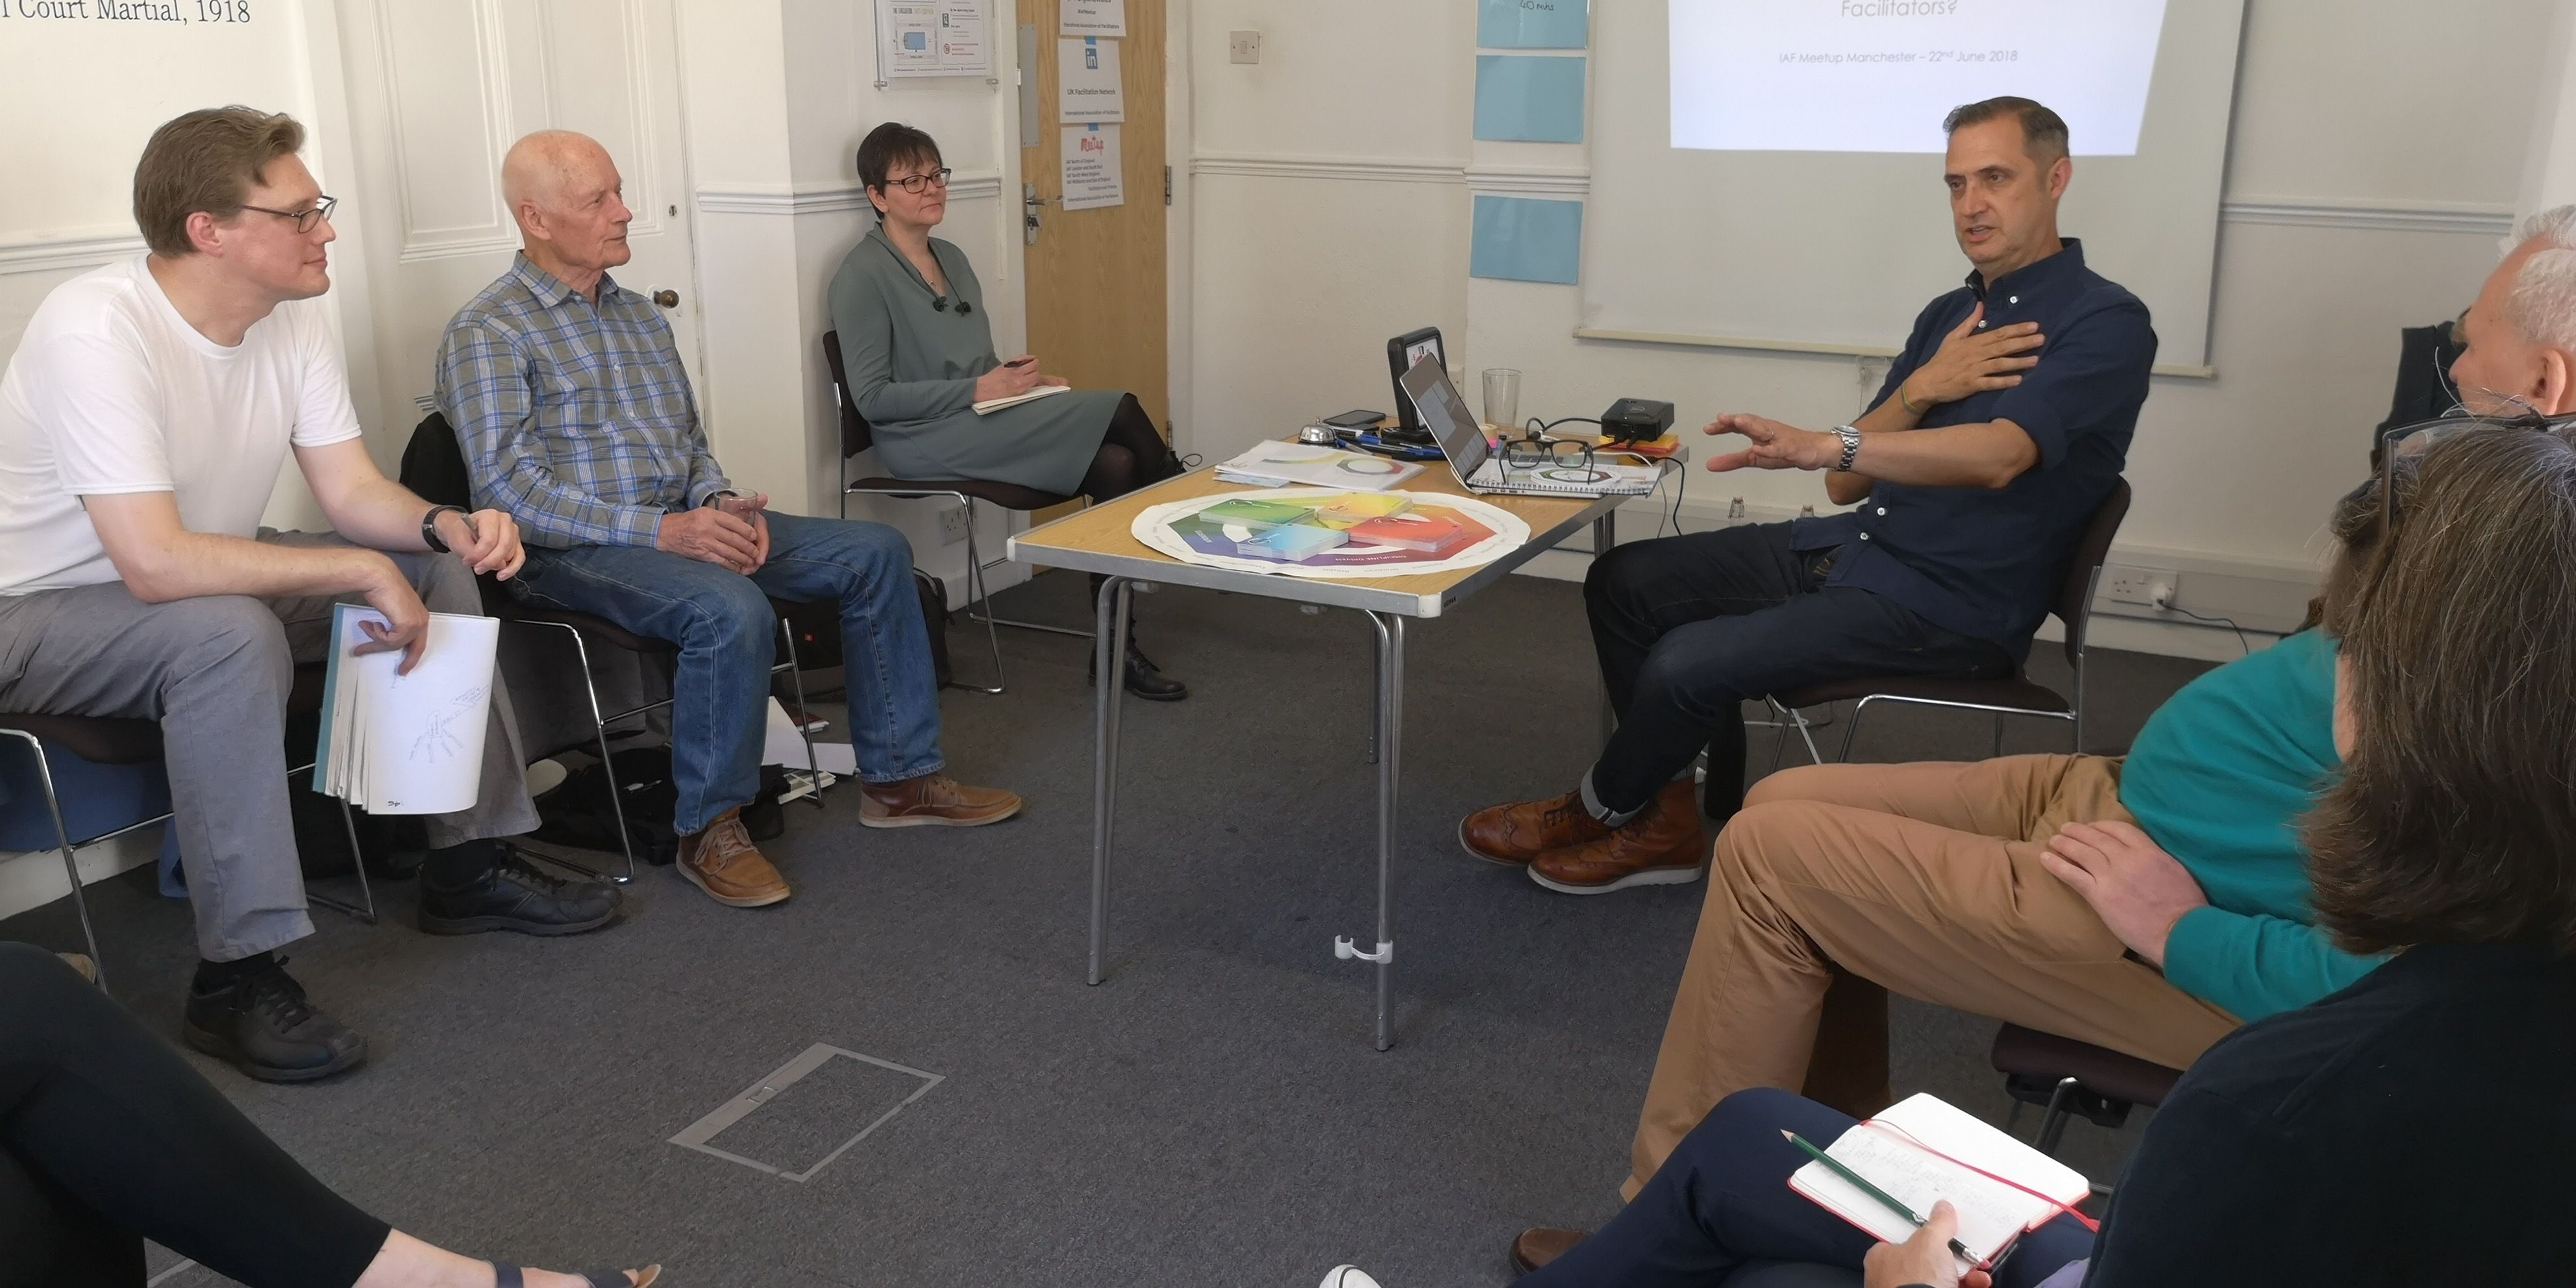 IAF North of England facilitators and friends